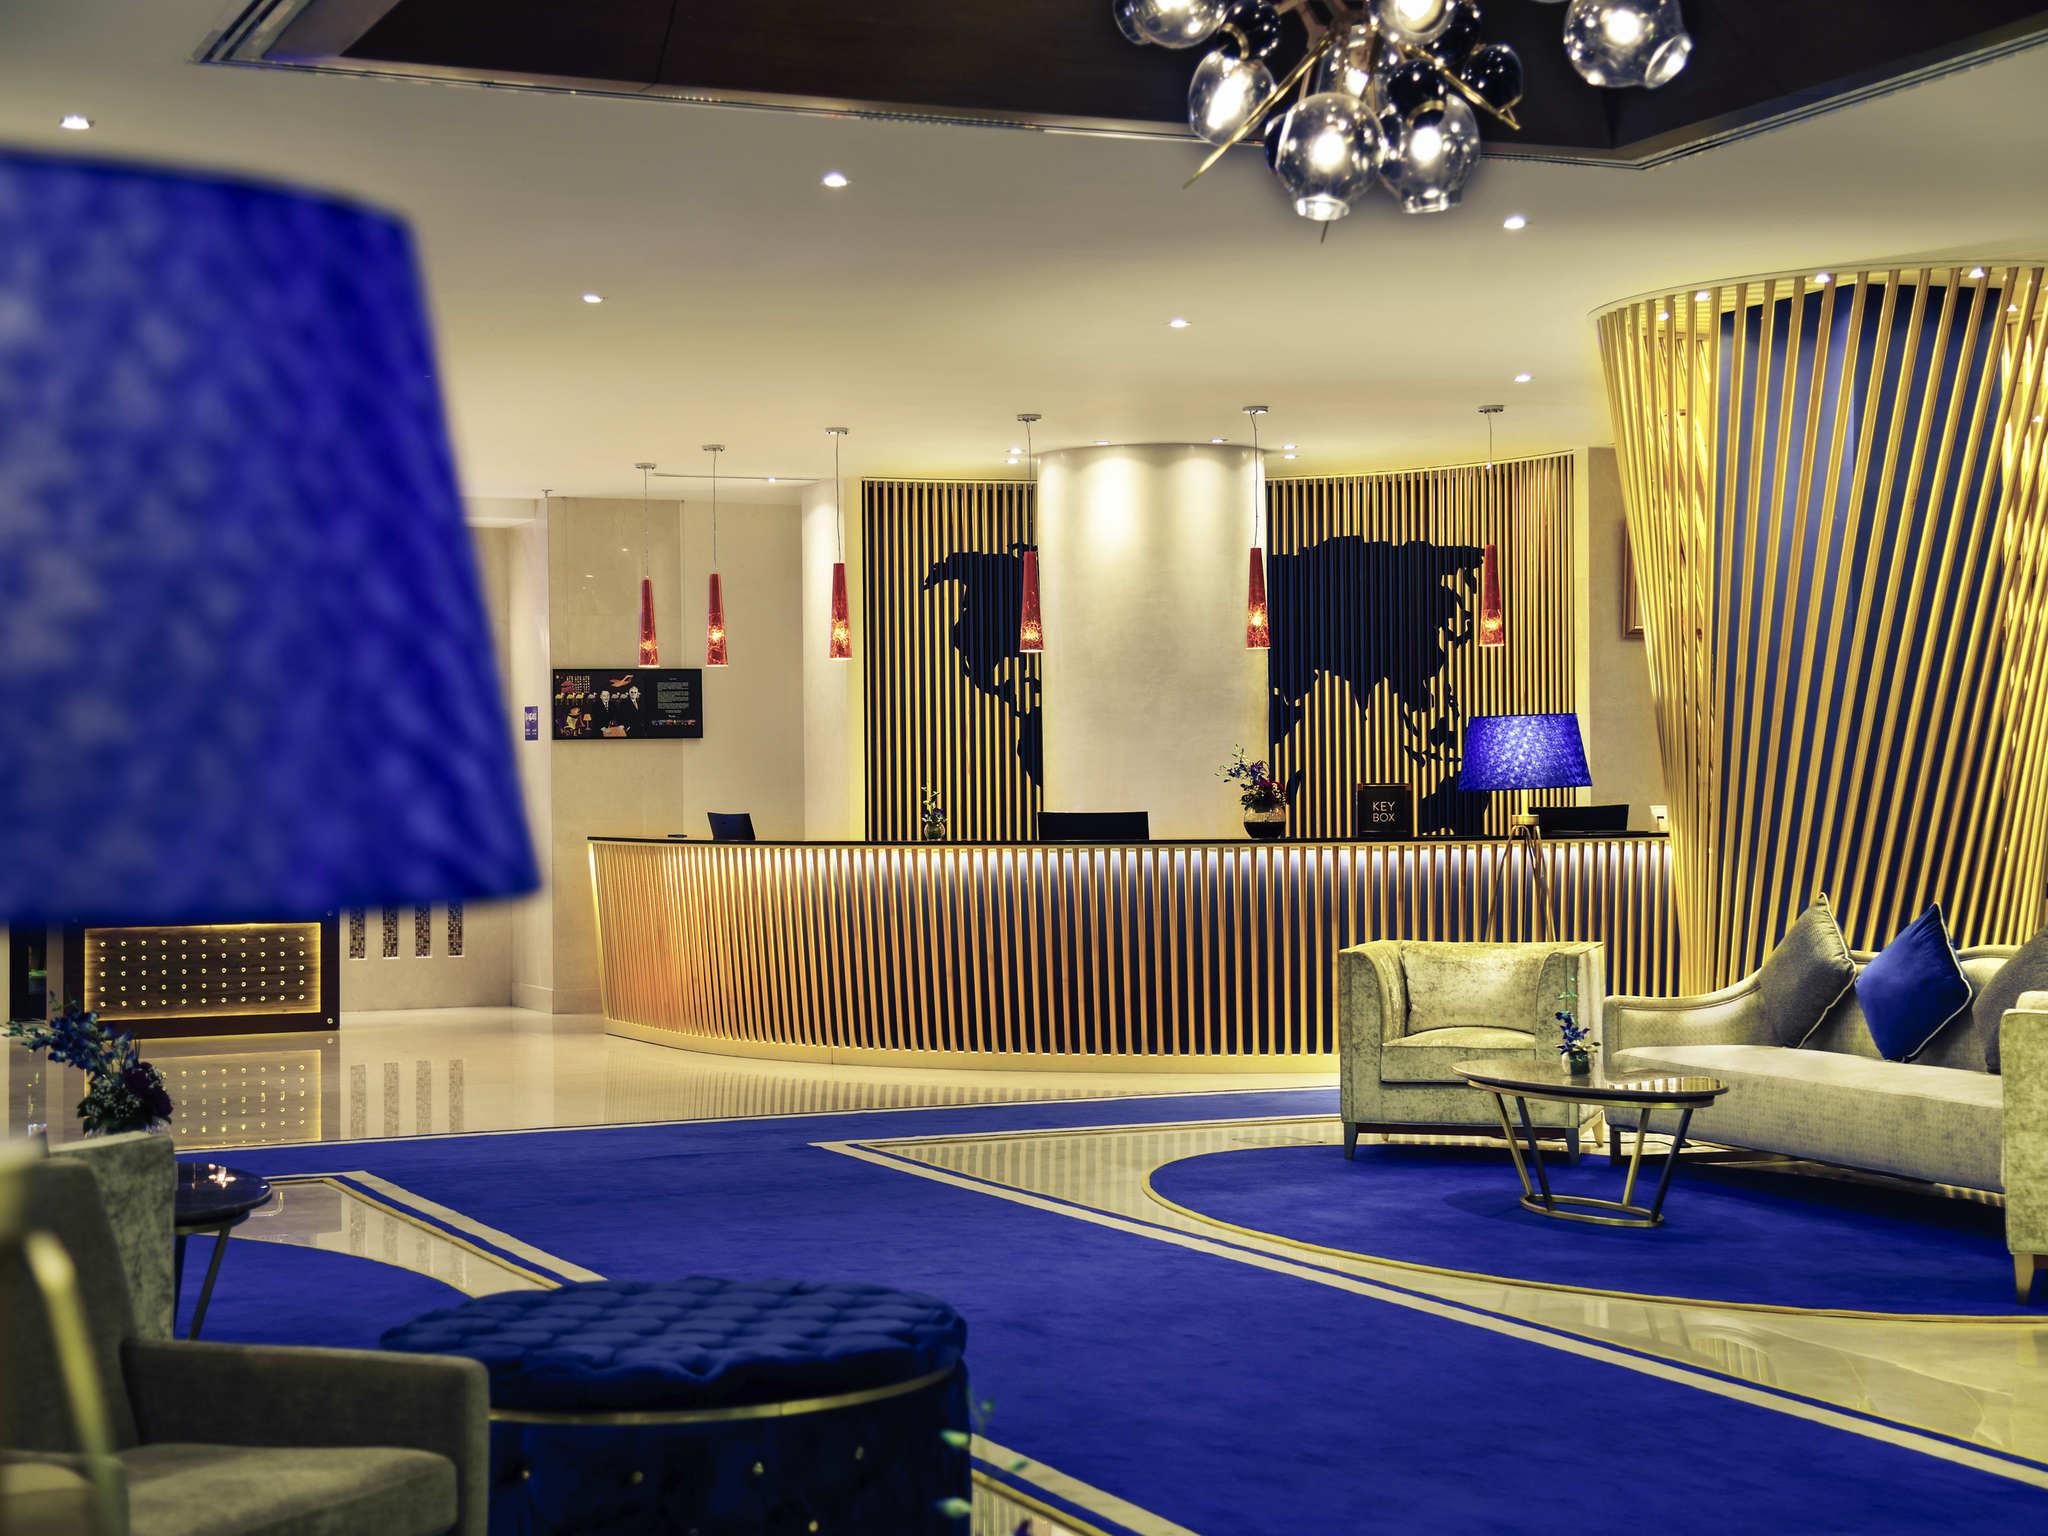 Hotel Silver Shine 4 Star Hotel In Dubai Mercure Gold Hotel Al Mina Road